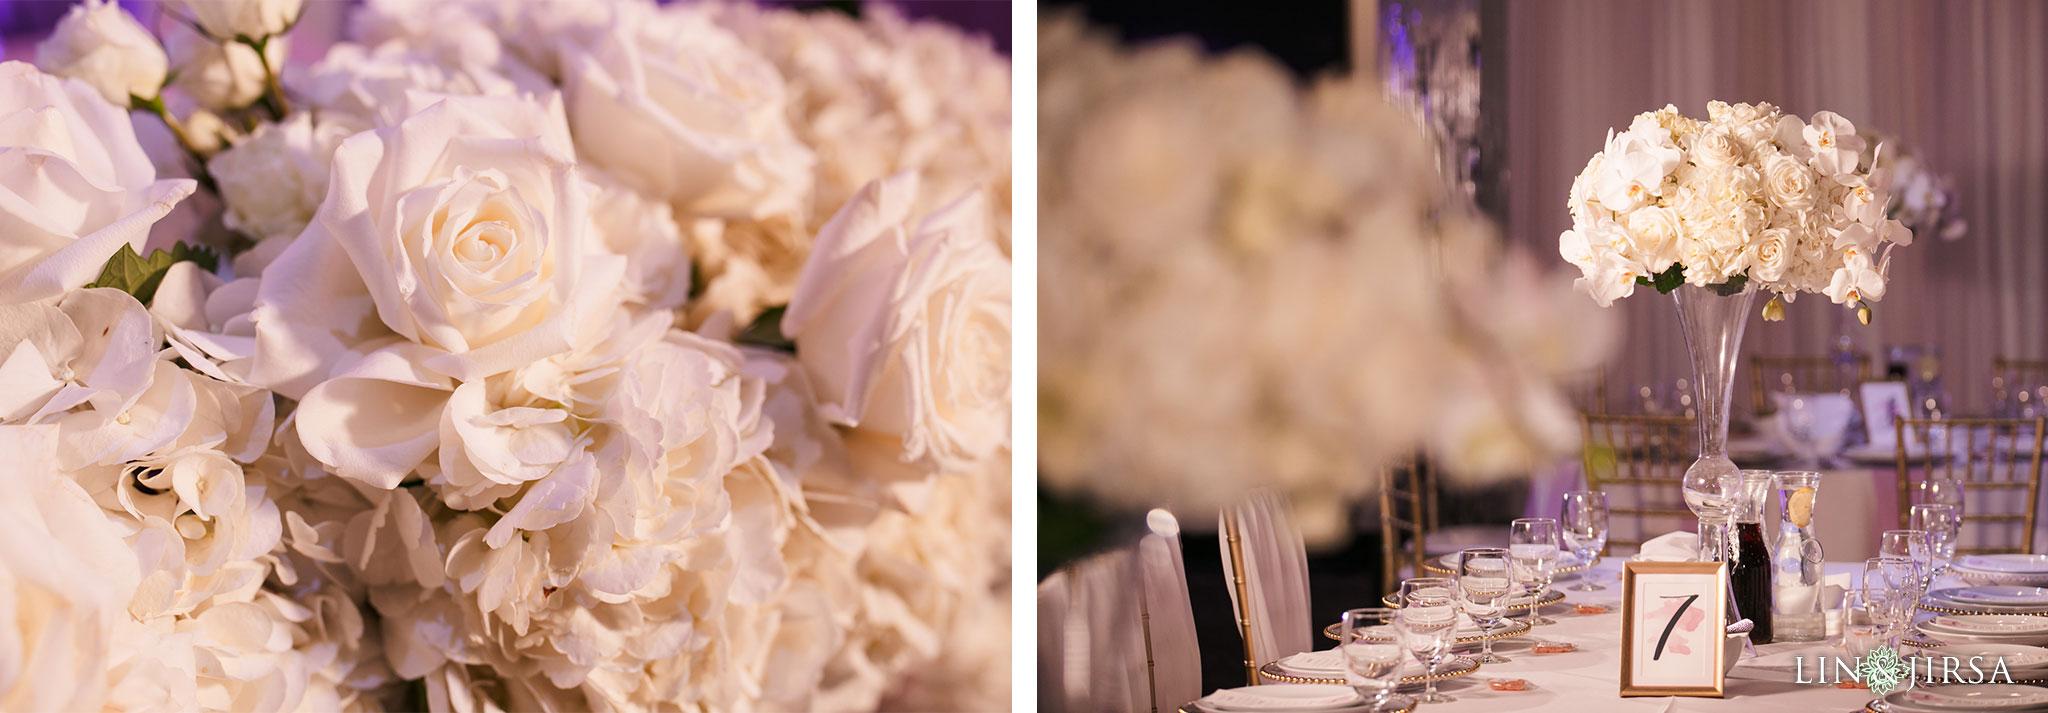 30 vertigo banquet hall glendale wedding photography